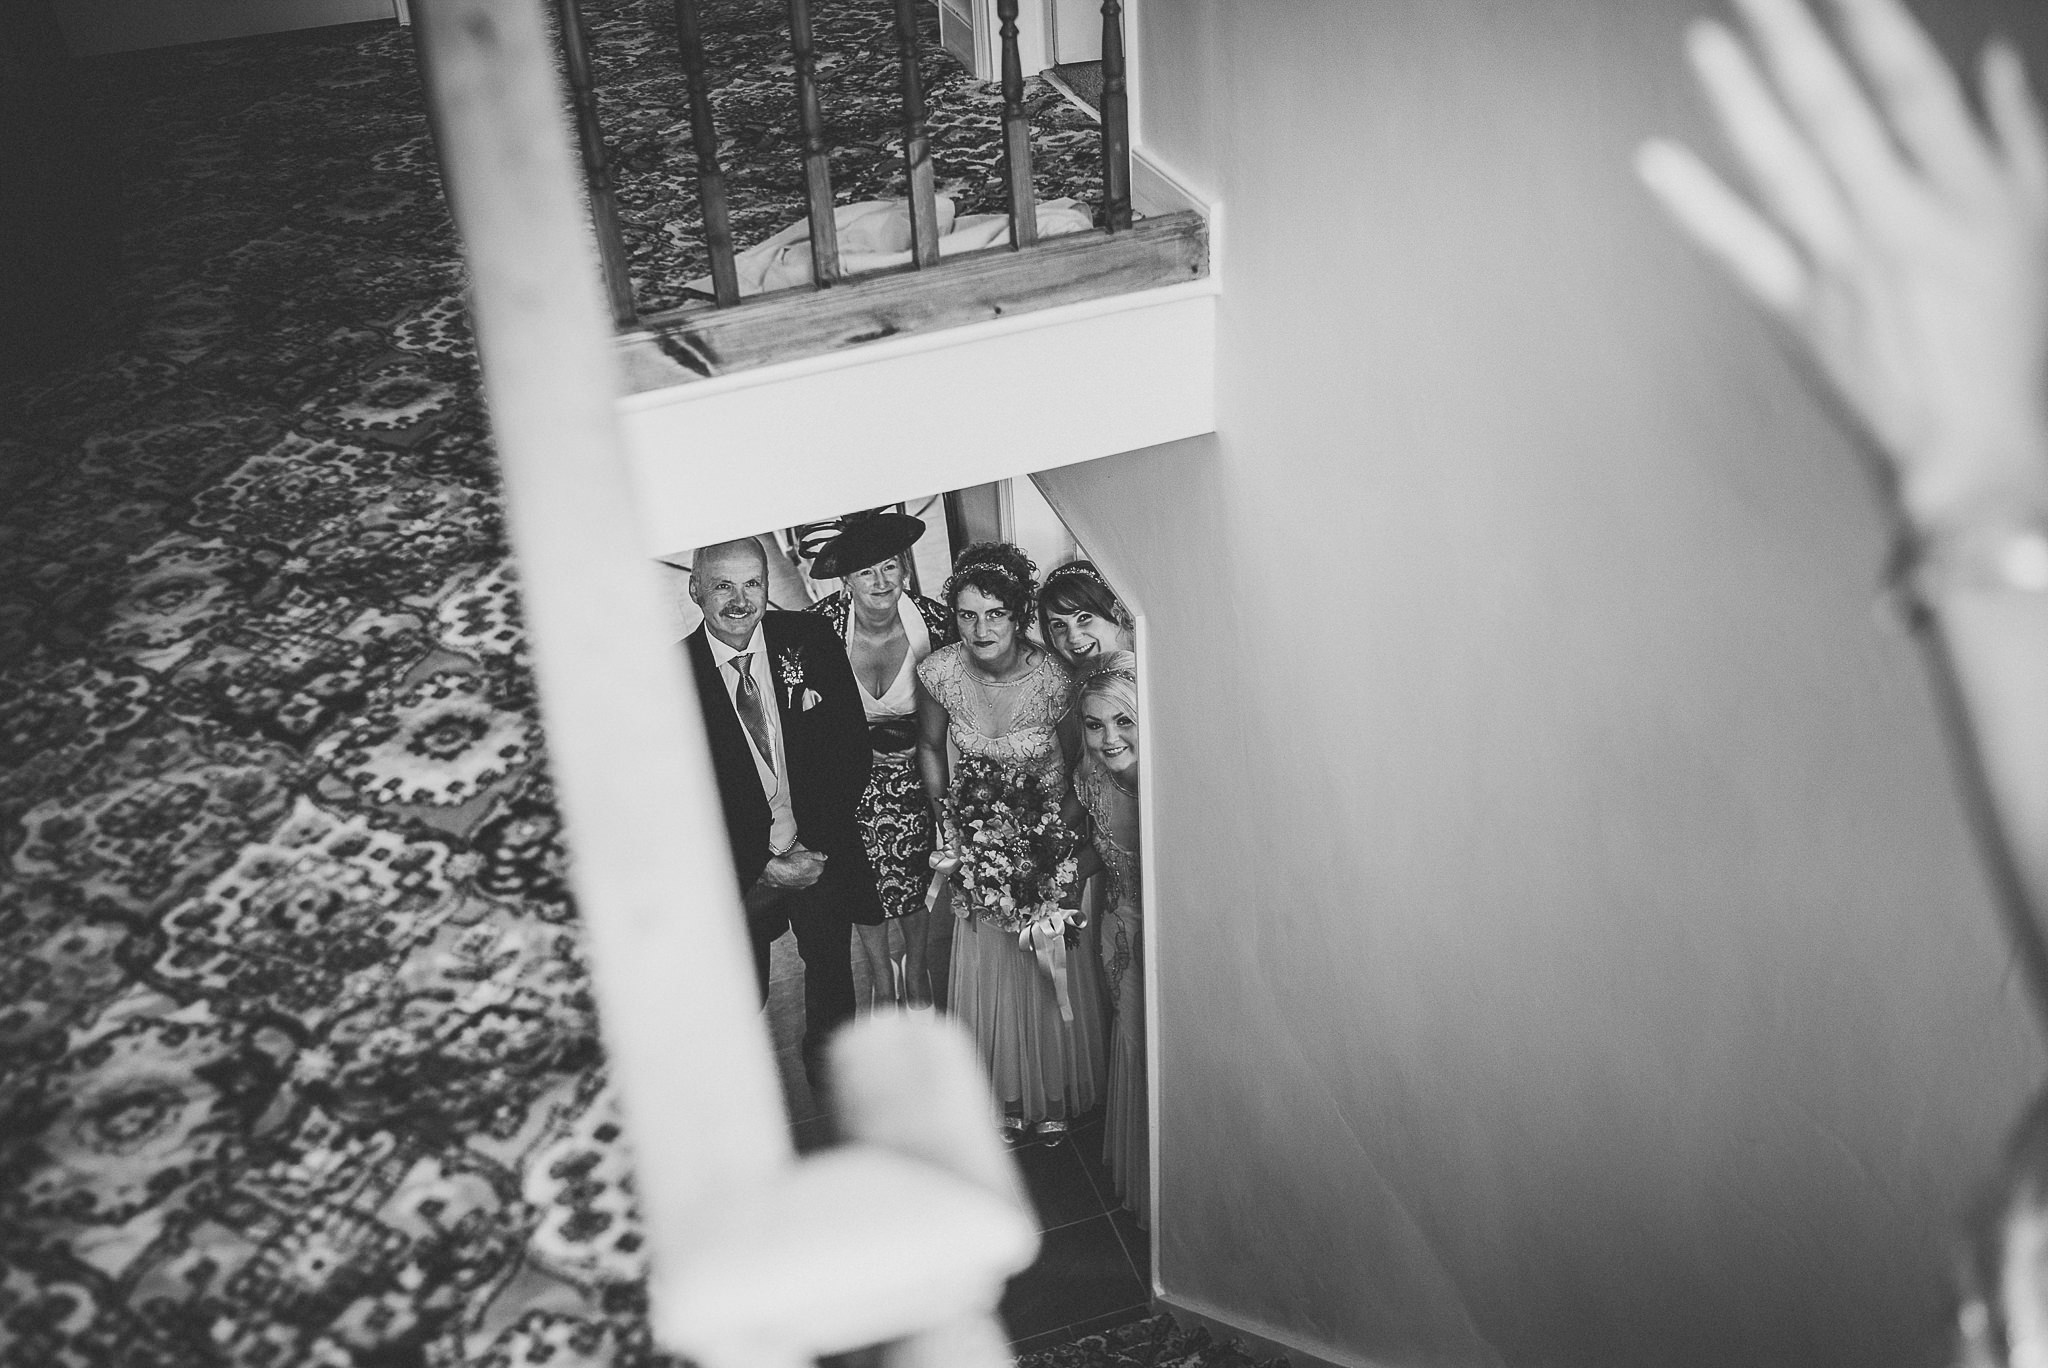 paul-marbrook-Farm-Wedding-Photographer-Lancashire-90021